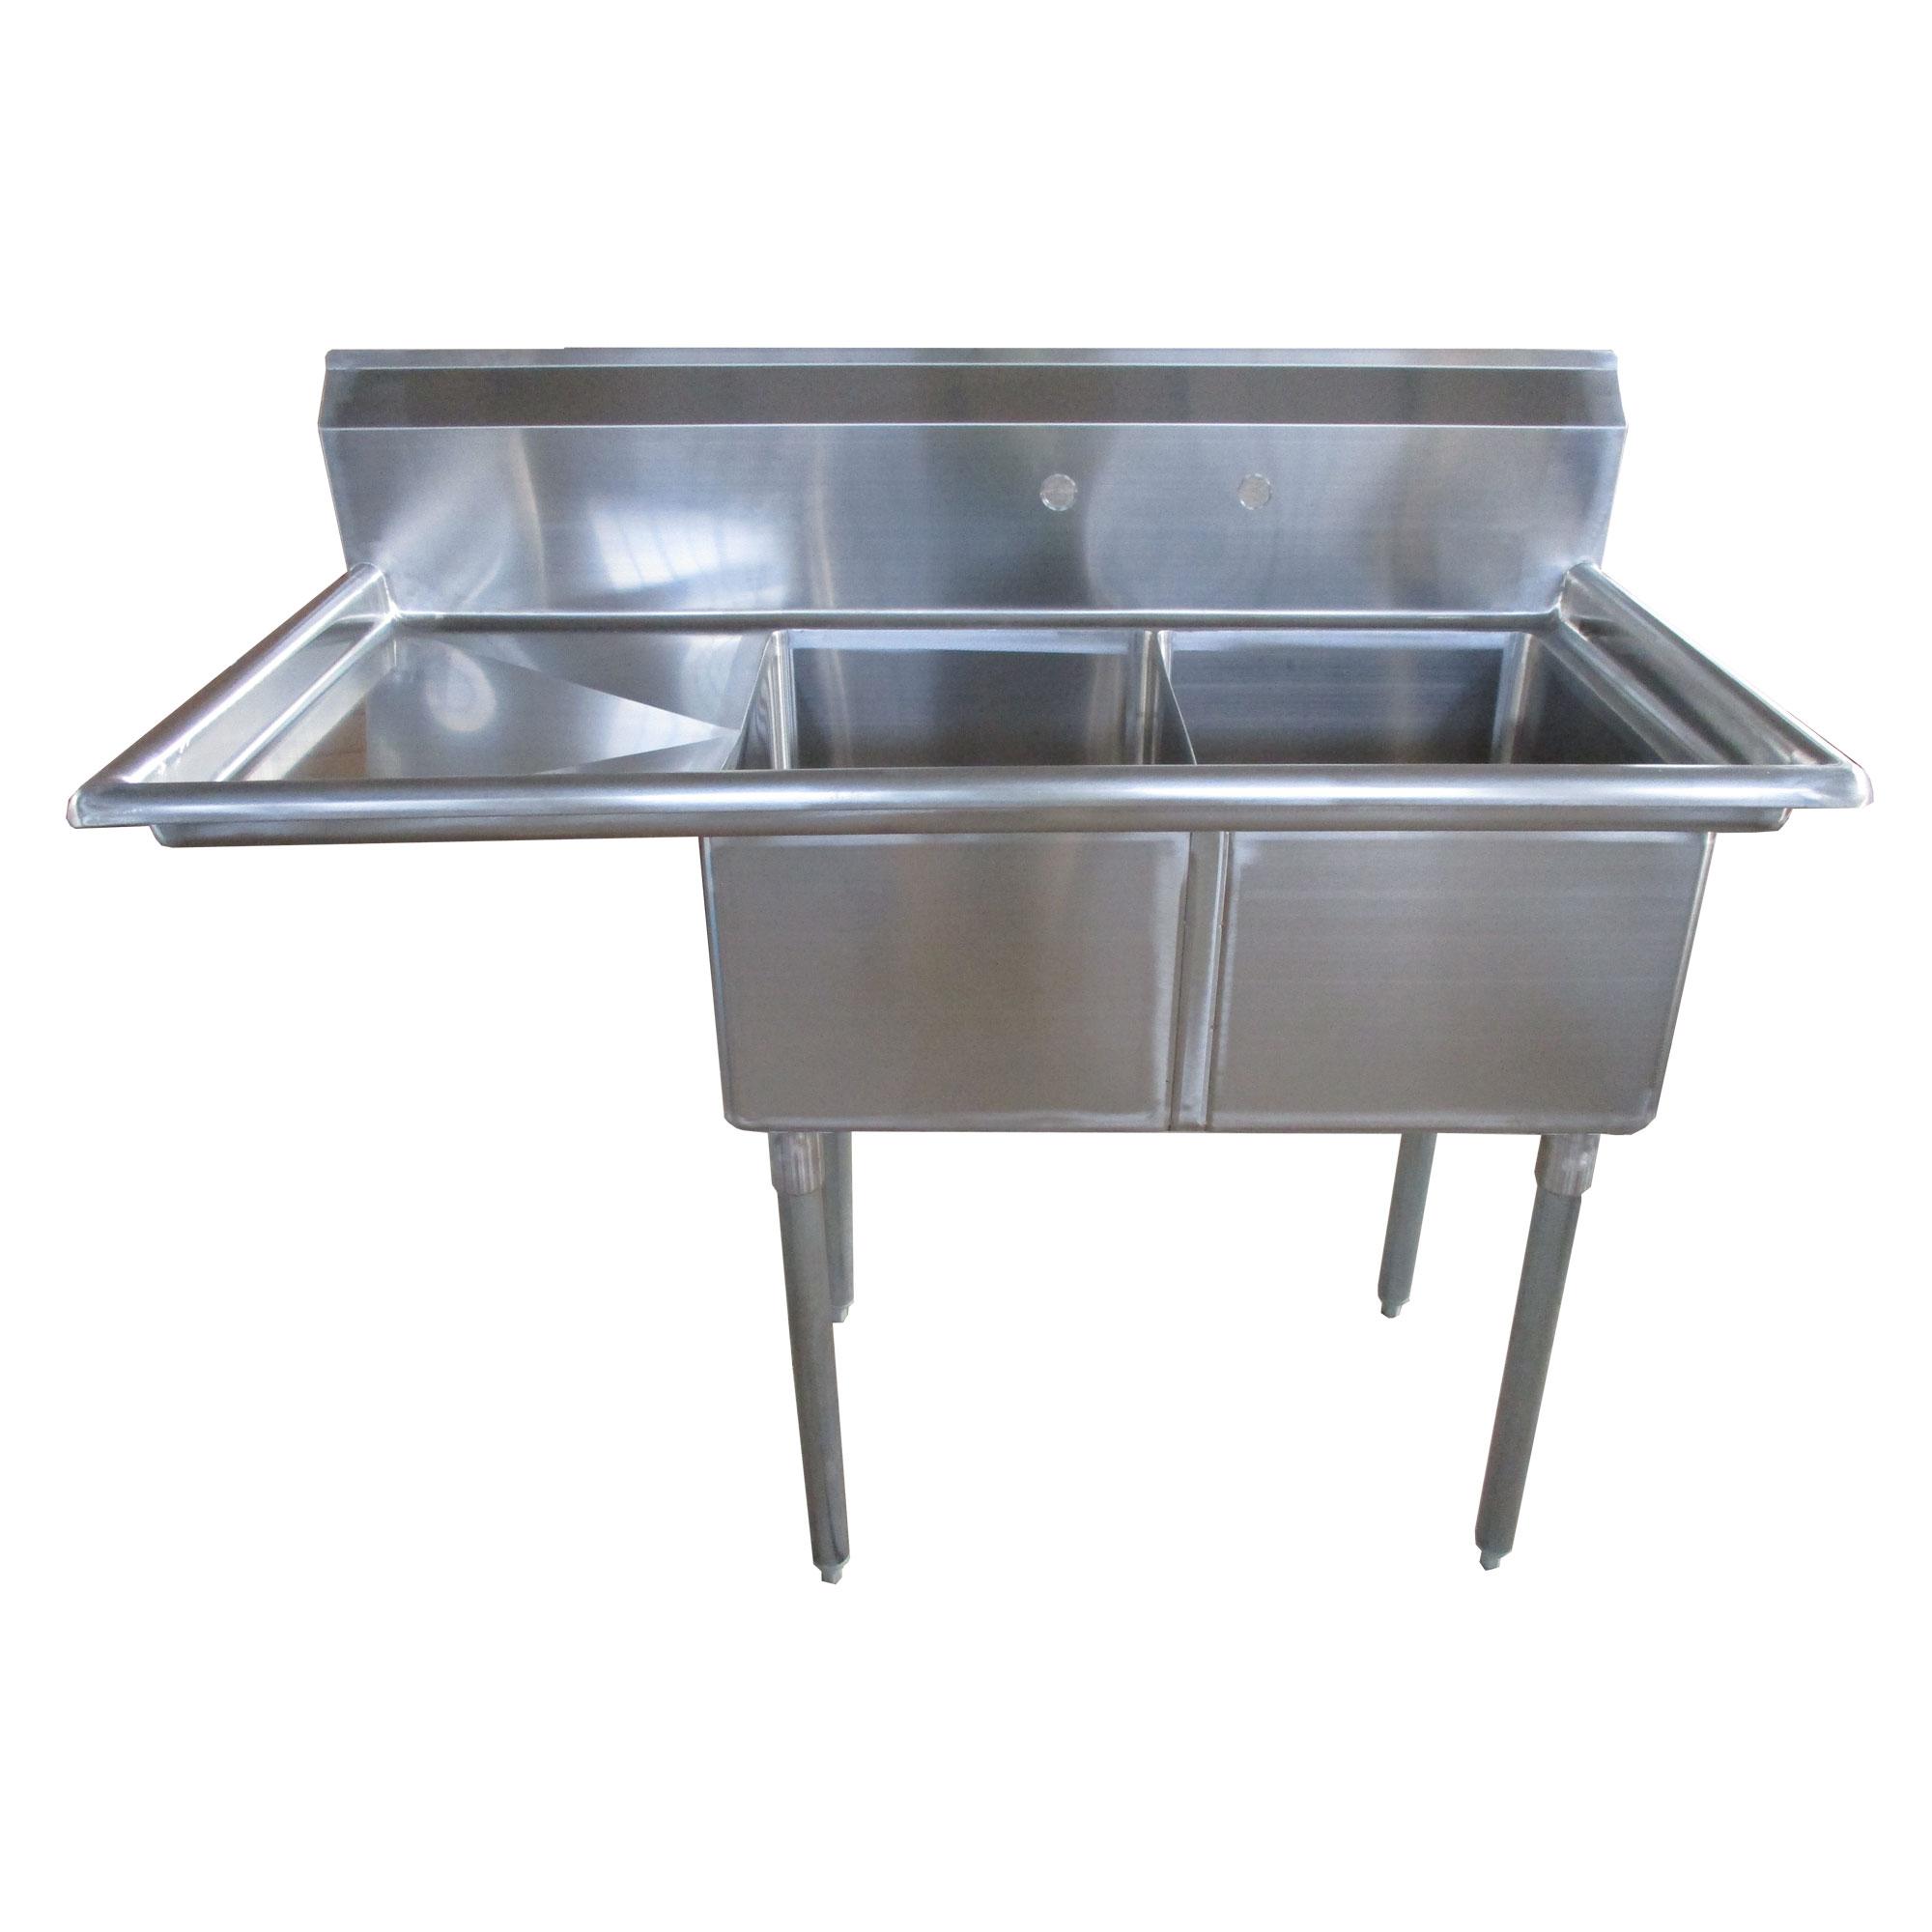 Image of Atlantic Metalworks 2CS-162012-1* - 16x20x12 Economy 2 Bowl 1 Drainboard Sink